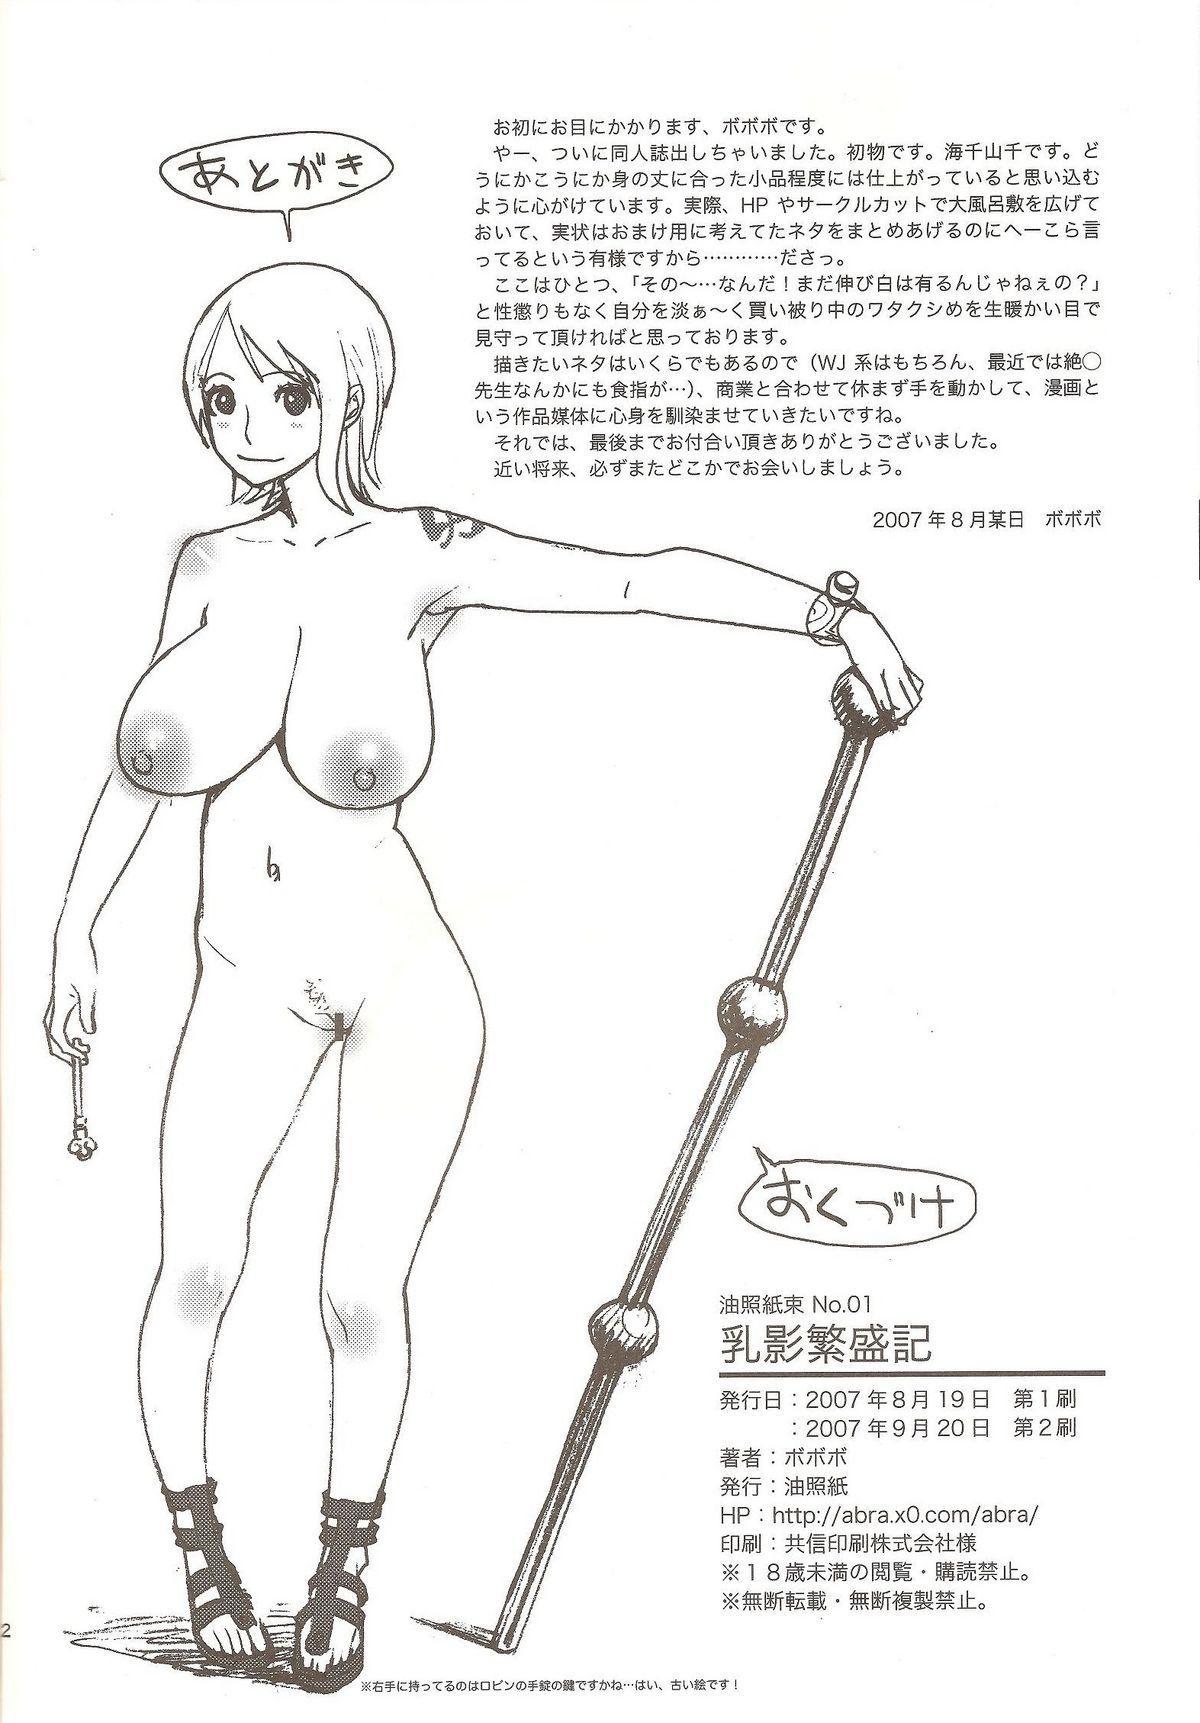 AbRAdEli kAMiTAbA No. 01 Chichikage Hanjouki 20